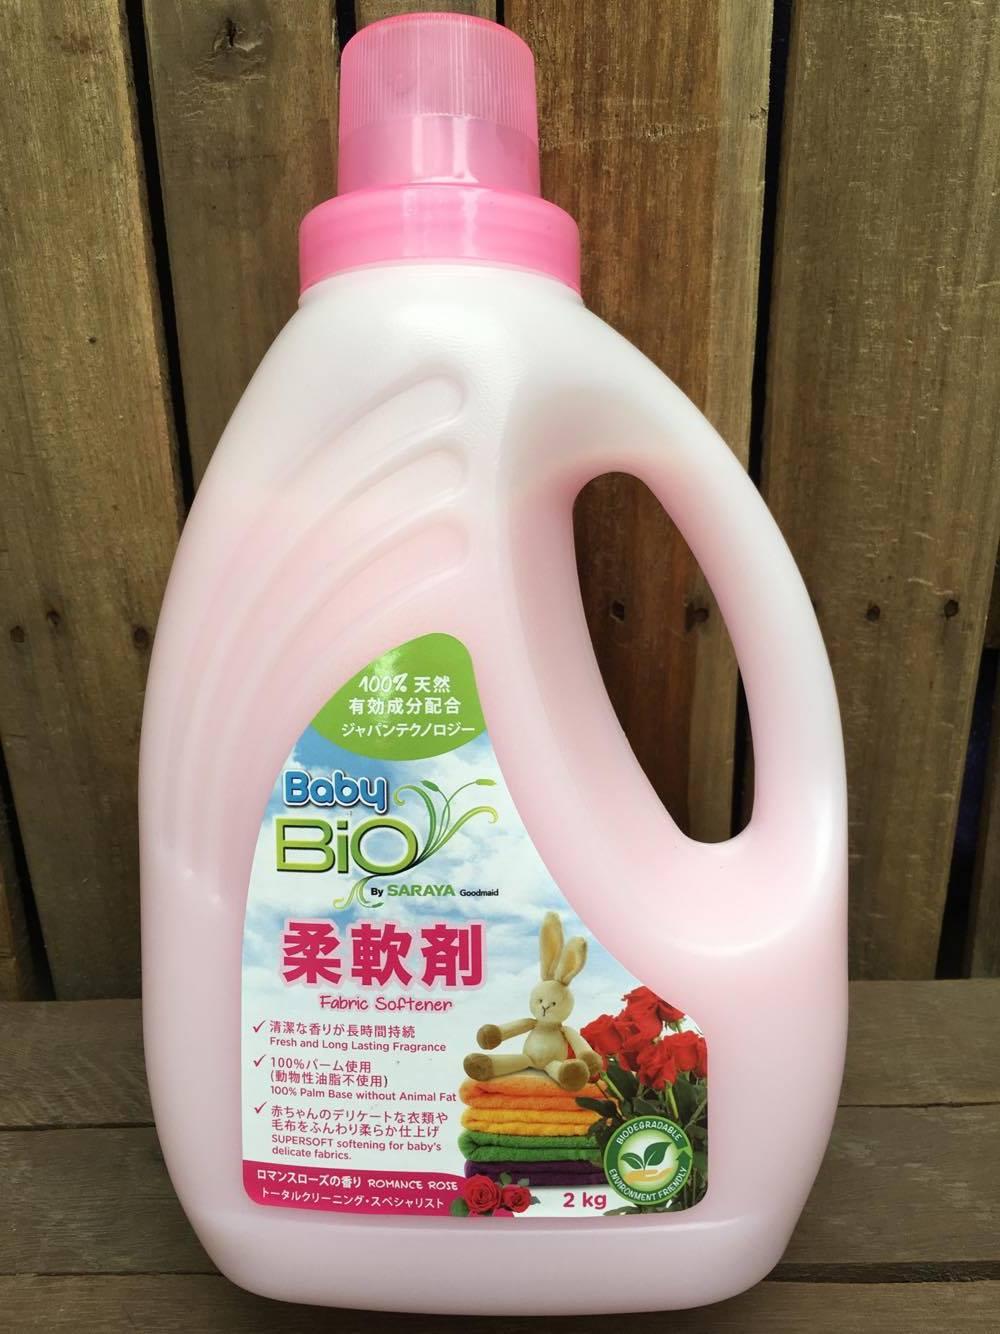 Nước giặt xả2in1 Bio 2kg - Nhật